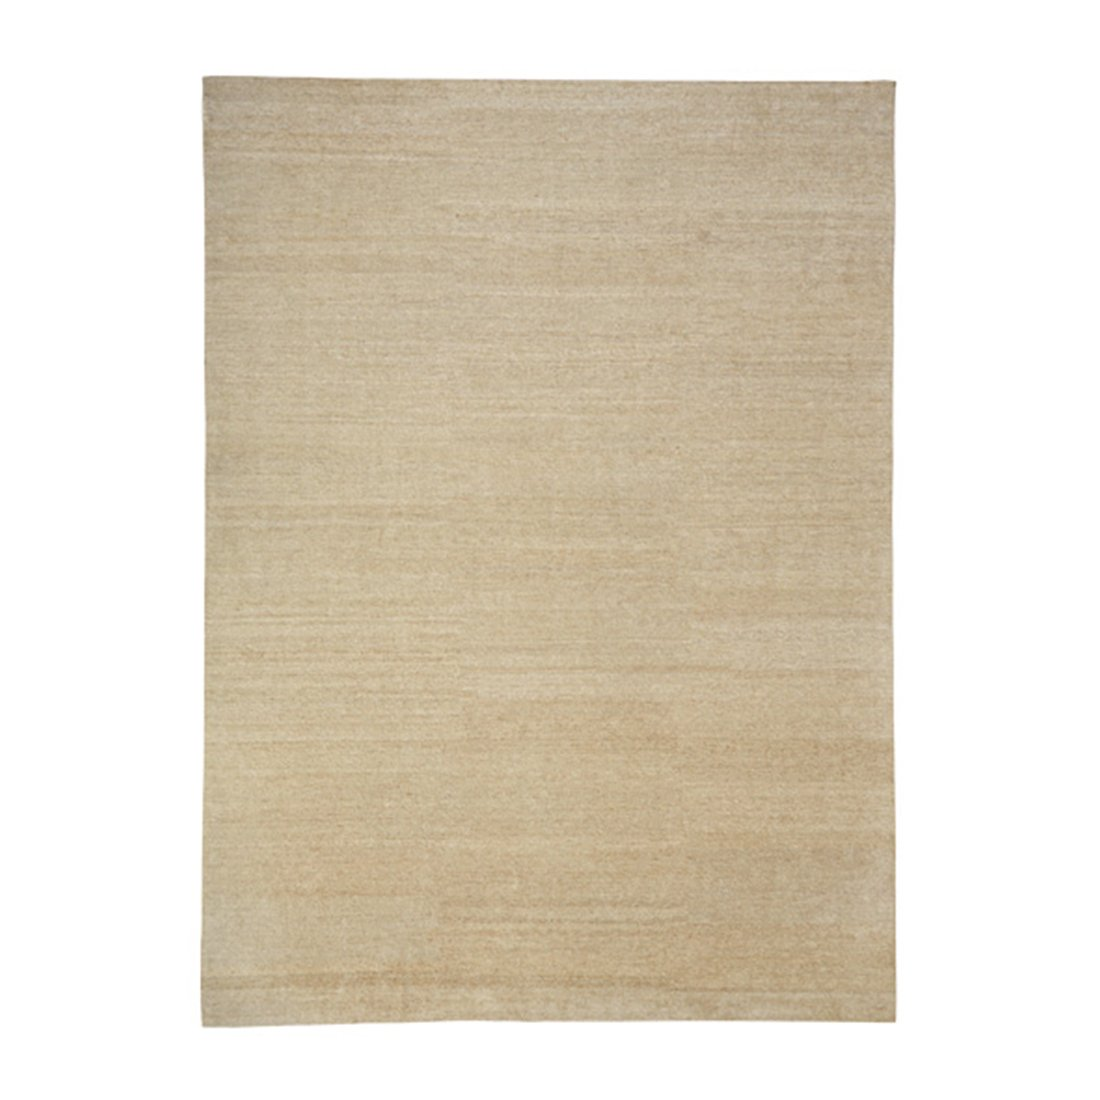 Walter Knoll Legends of Carpets Vloerkleden Imole